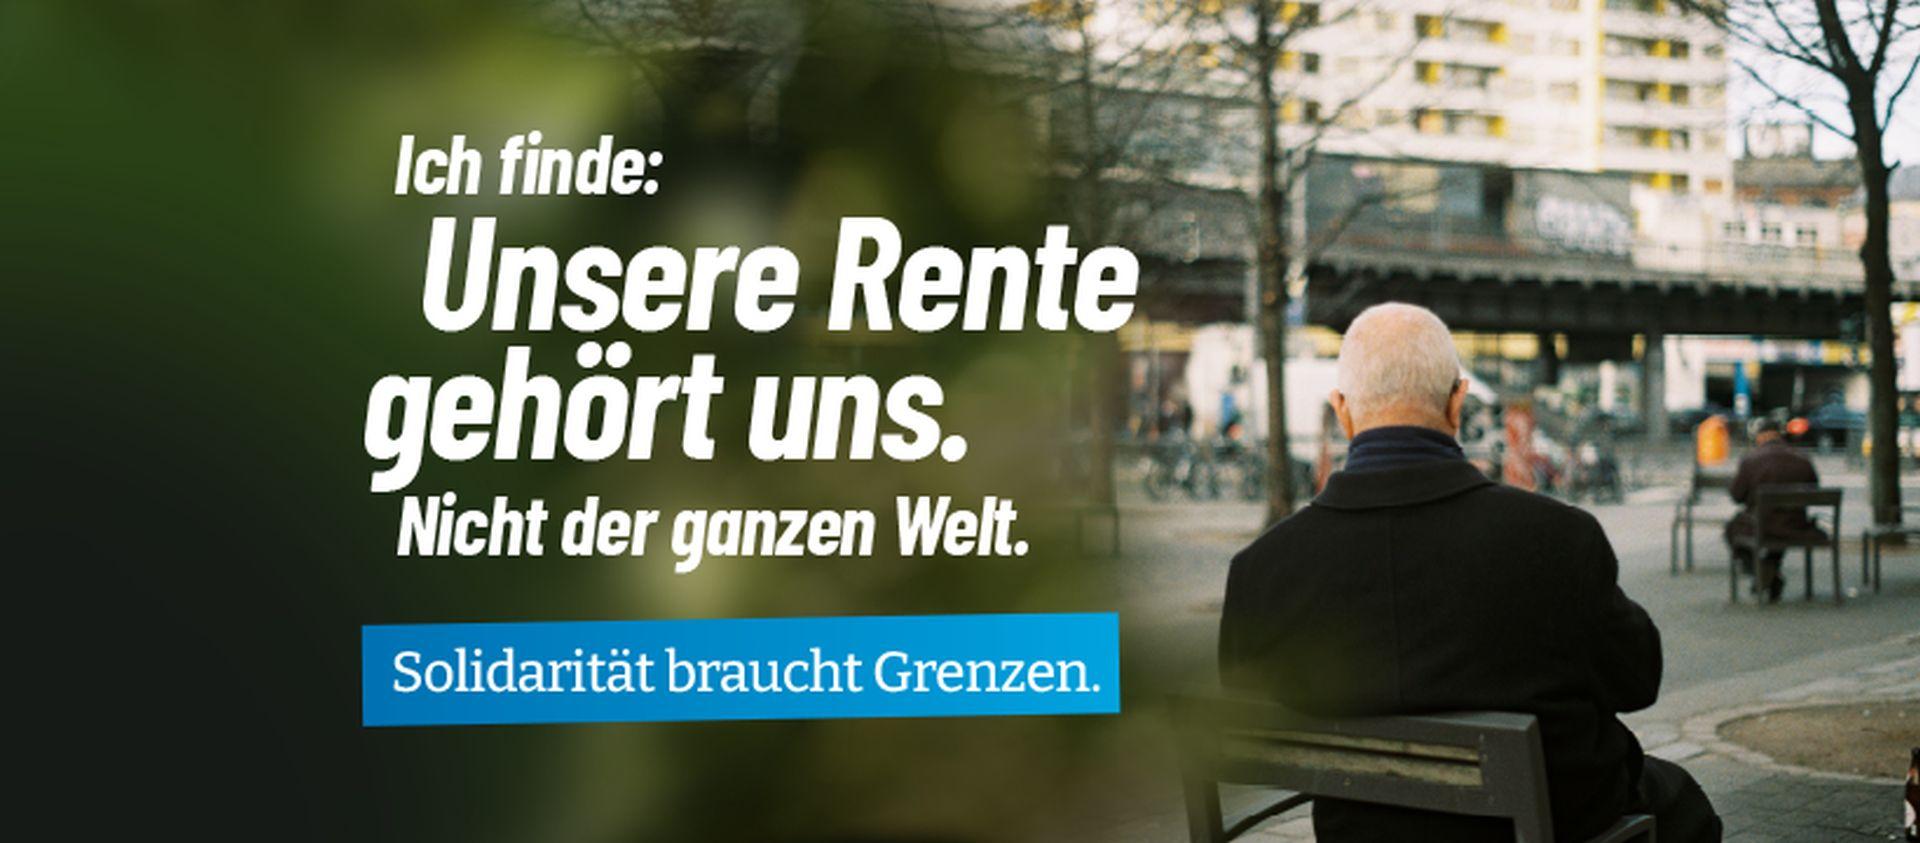 FB_Cover_Photo_Kampagne2_Rente_2